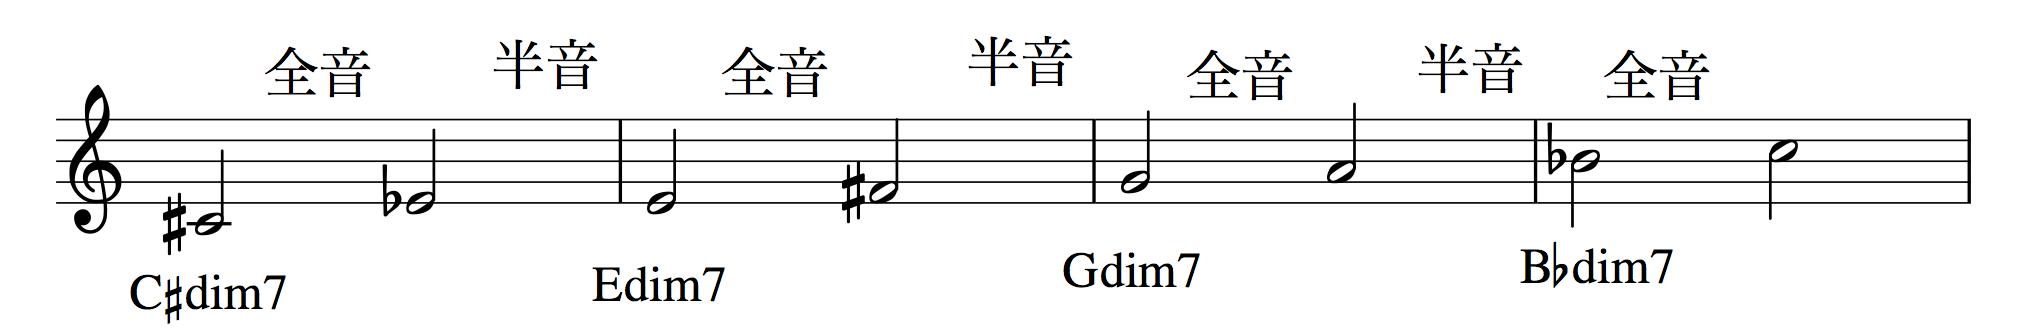 diminish-1